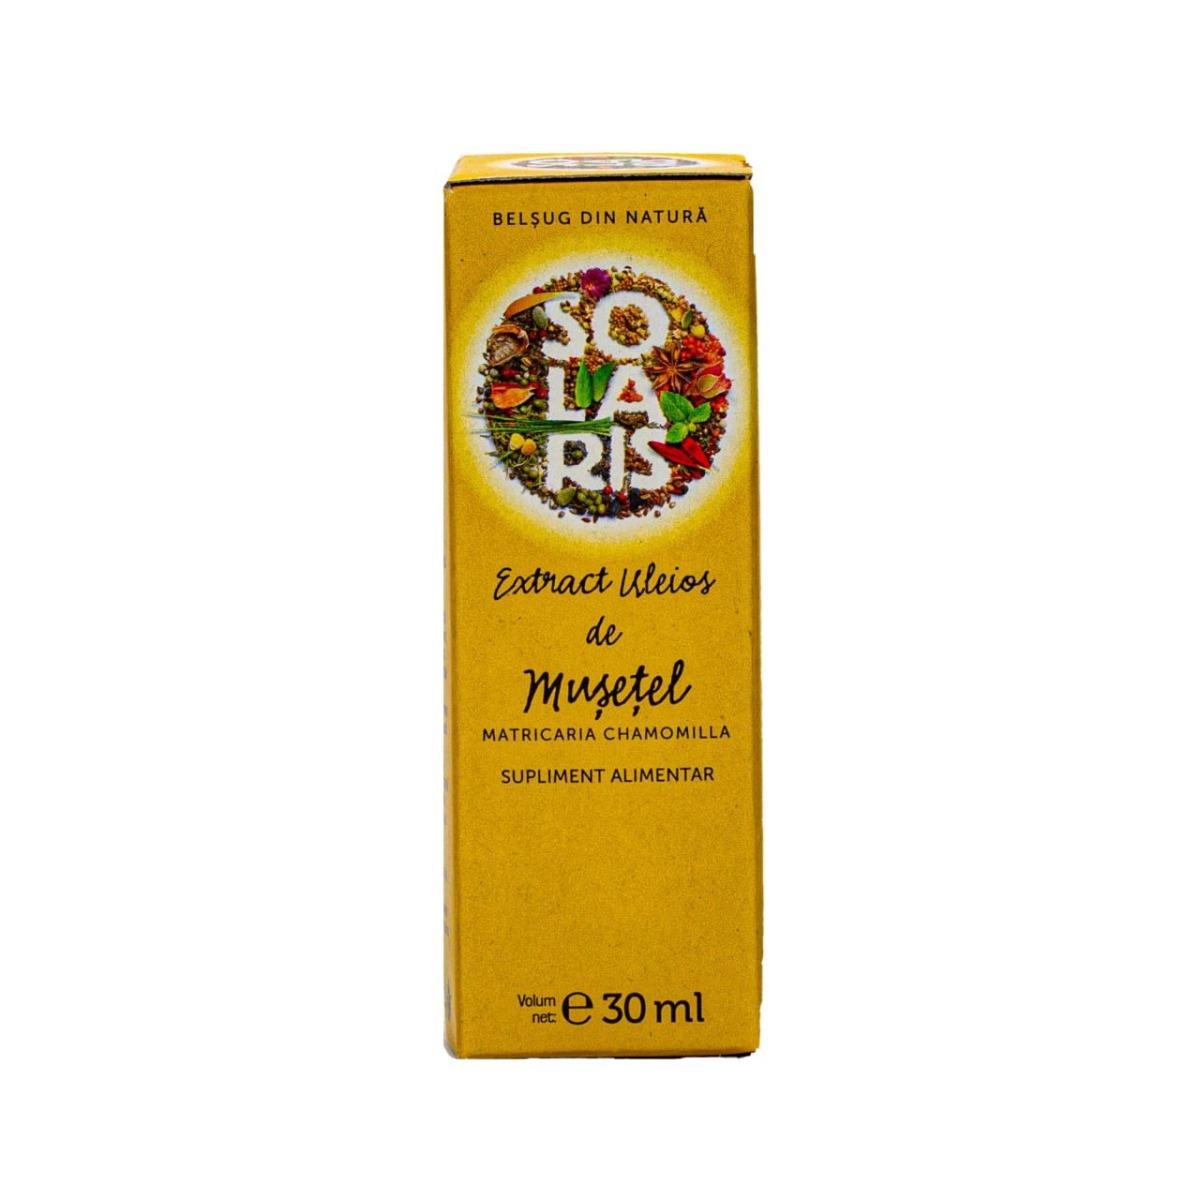 Extract uleios de musetel, 30ml, Solaris drmax.ro